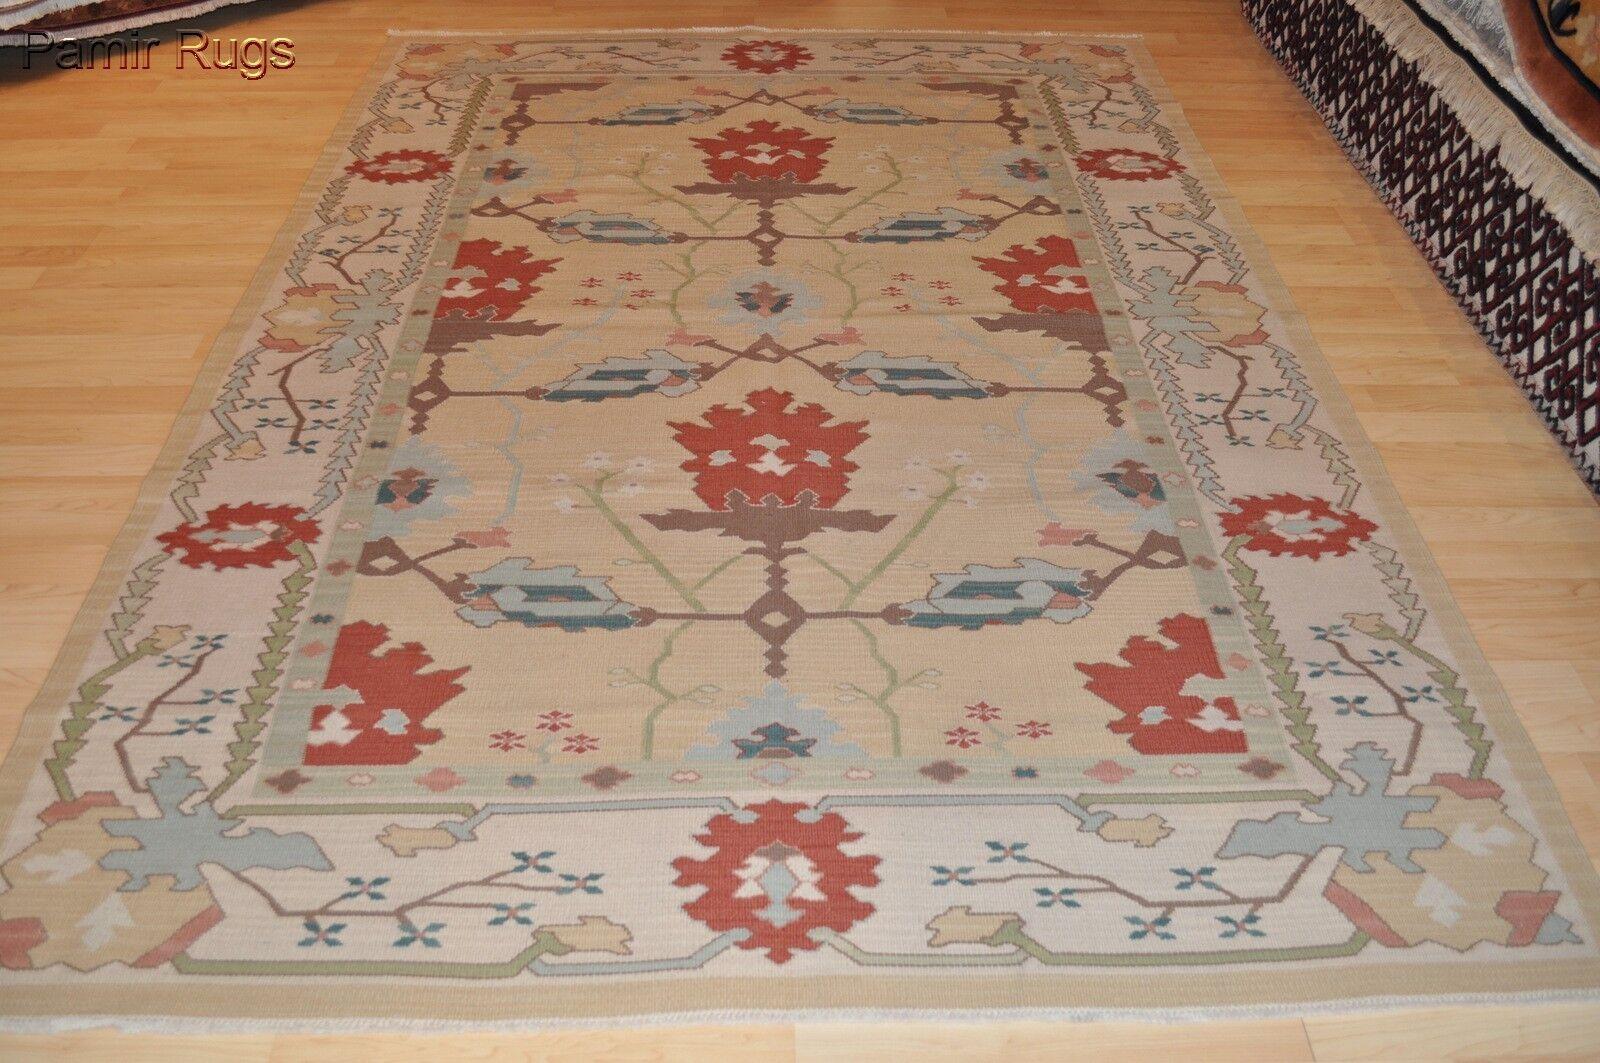 6x9 Ft Handmade Hand Woven Flat Woven Kilim Rug Oushak